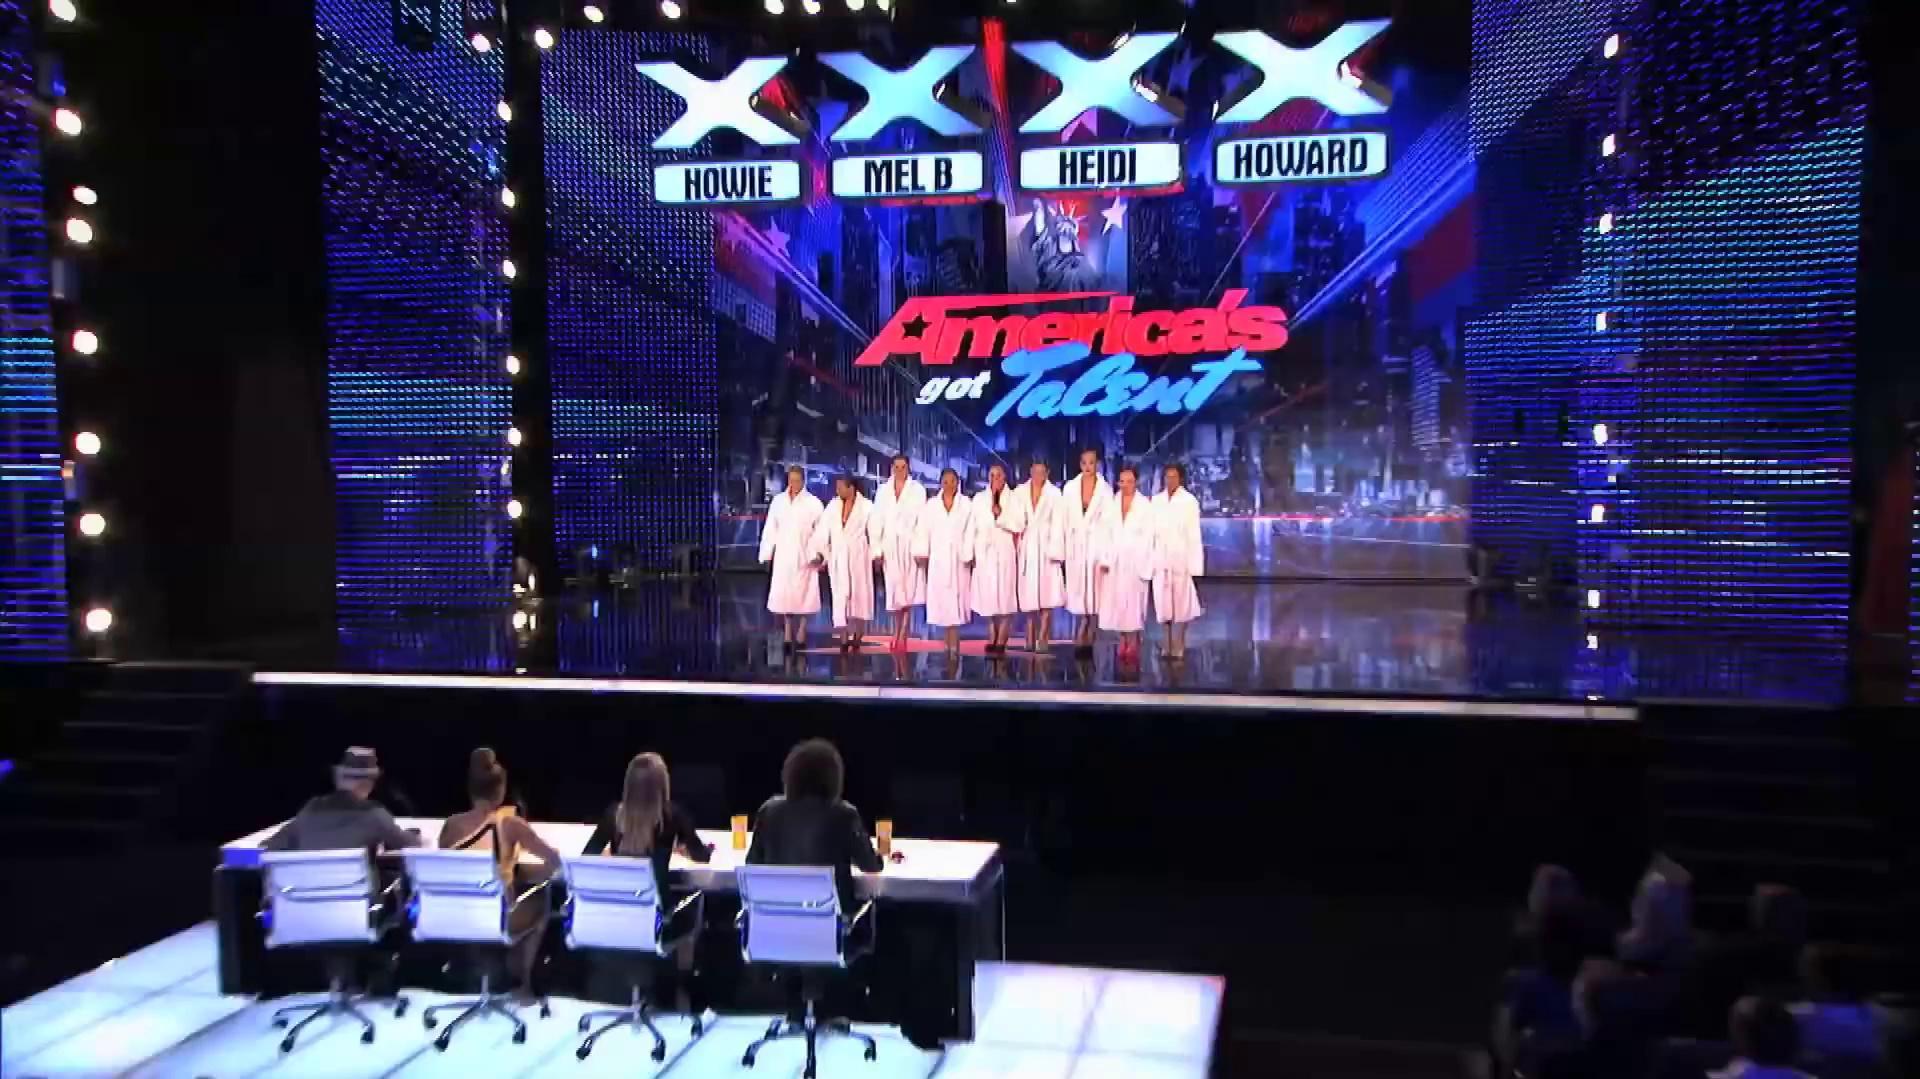 America's_Got_Talent_2013_-_Season_8_-_094_-_The_Aquanuts_-_Synchronized_Swimming_In_High_Heels